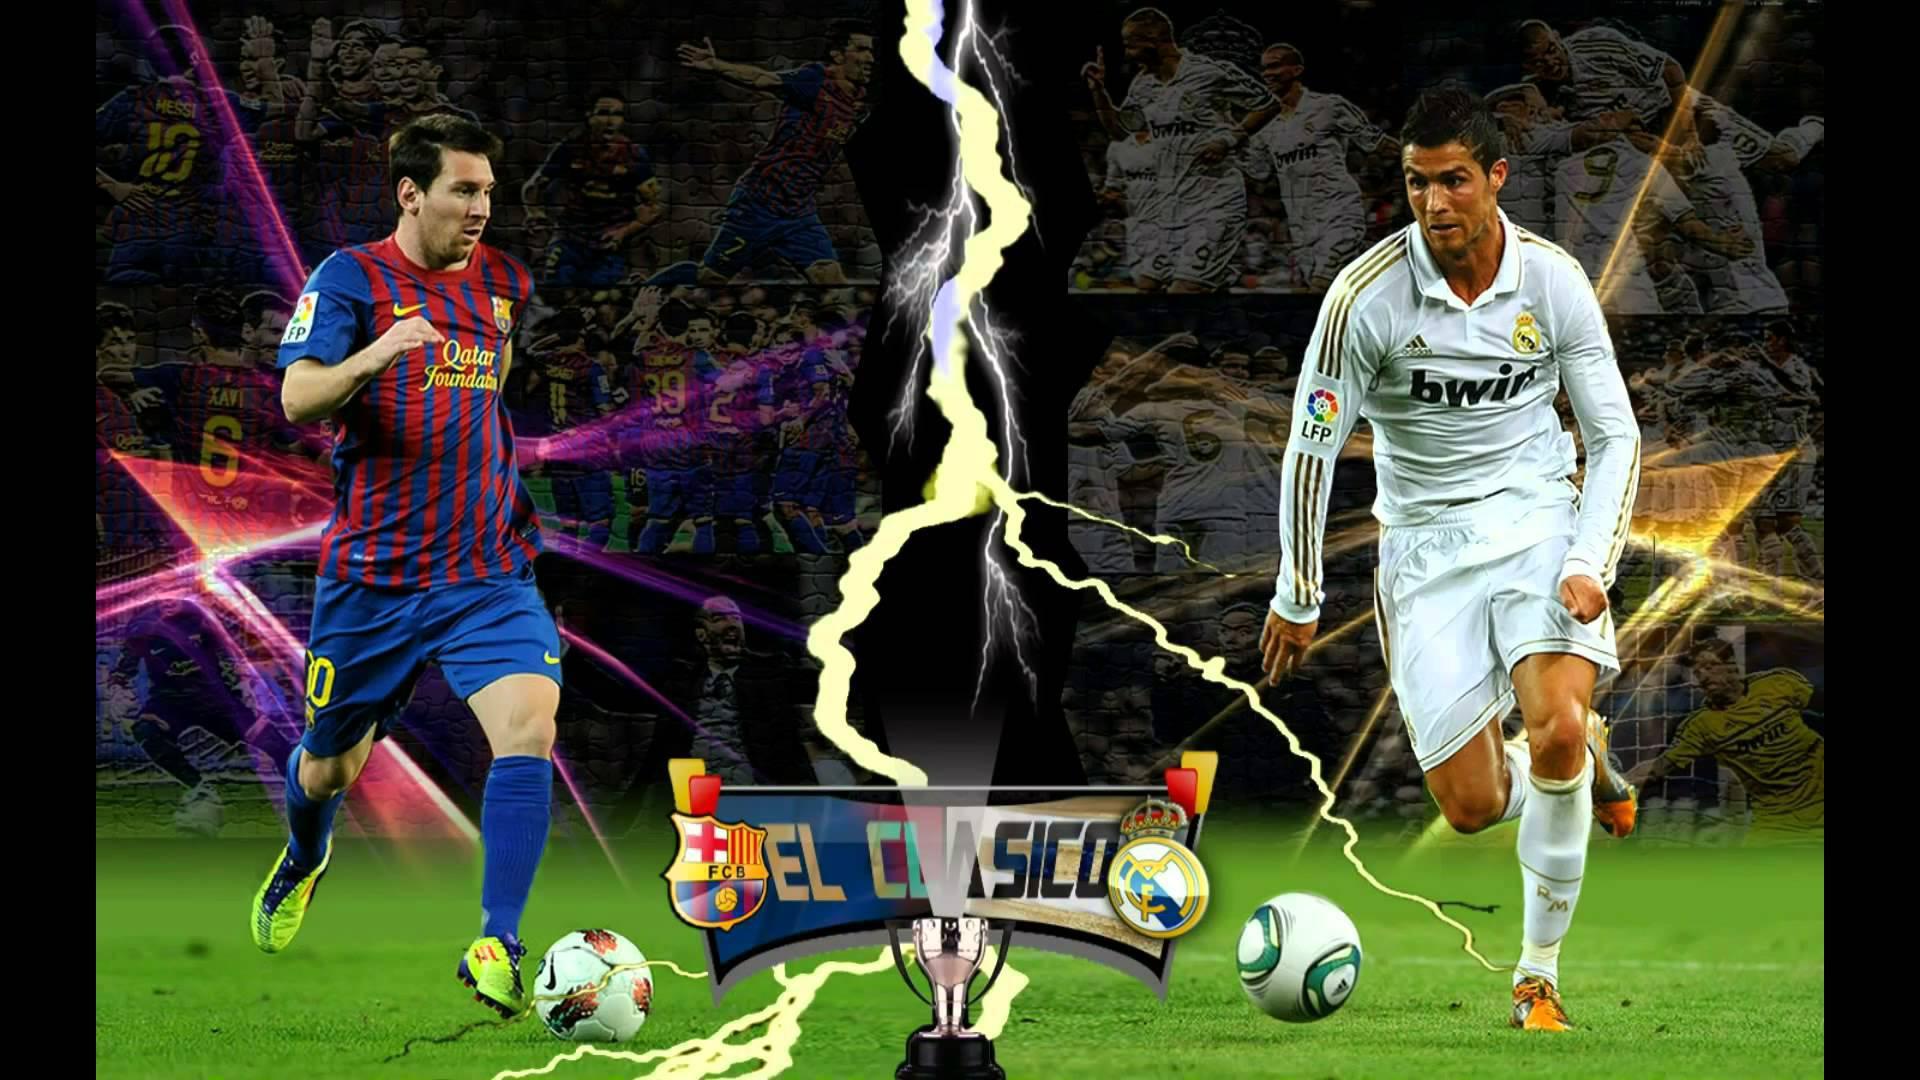 … Cristiano Ronaldo Vs Neymar Wallpaper Cristiano Ronaldo Vs Messi  Wallpapers 2015 – Wallpaper …